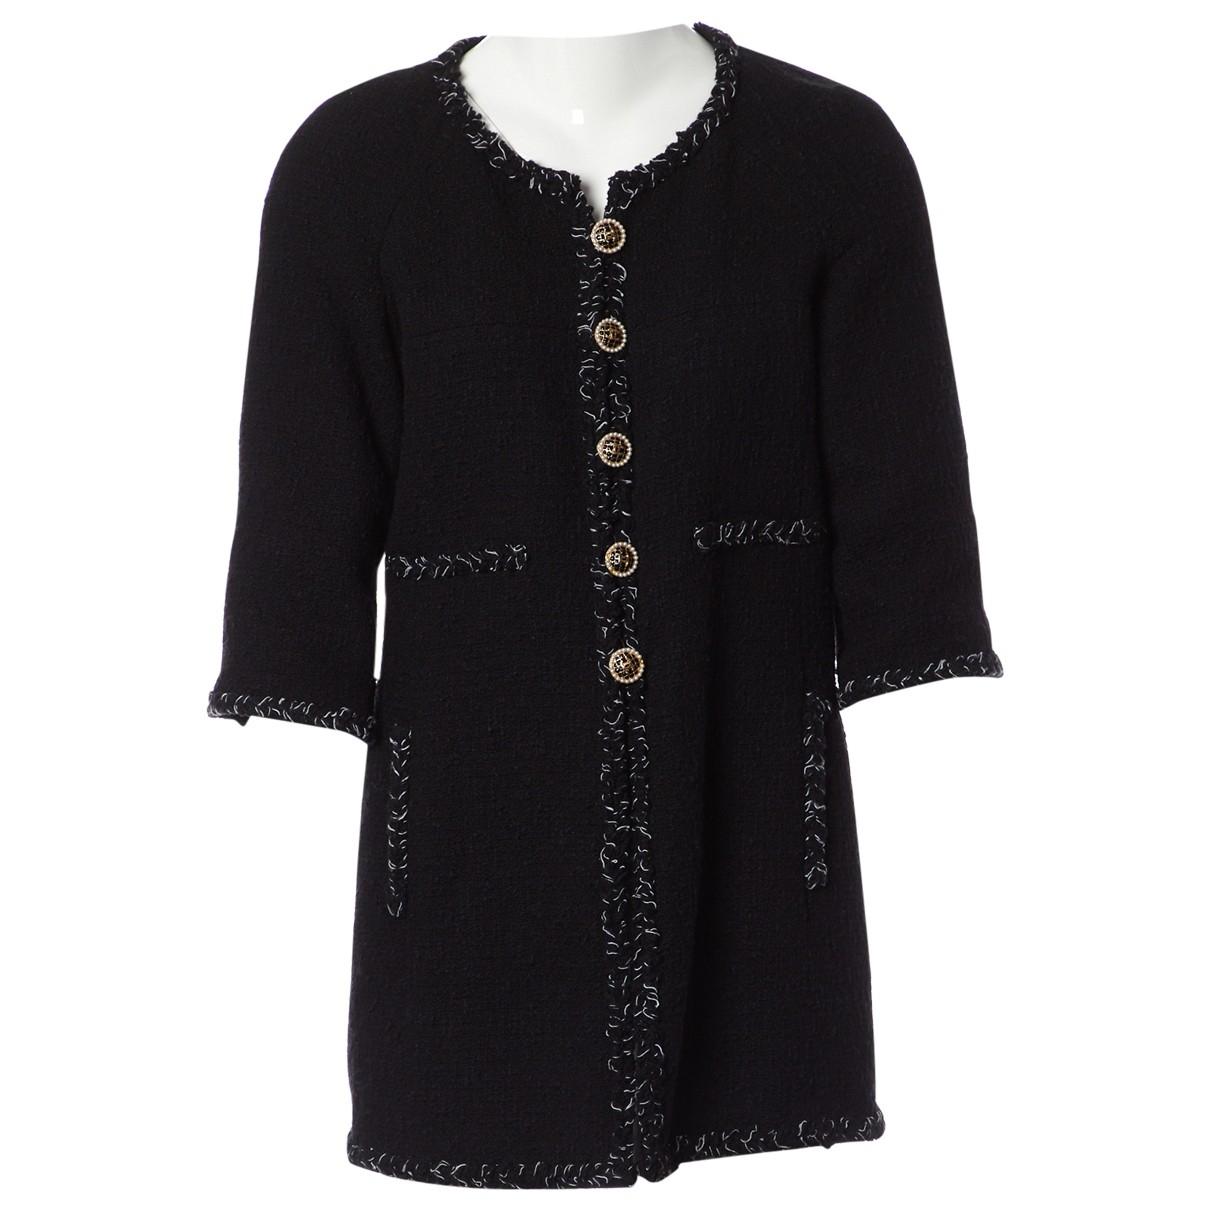 Chanel \N Black Cotton jacket for Women 40 FR